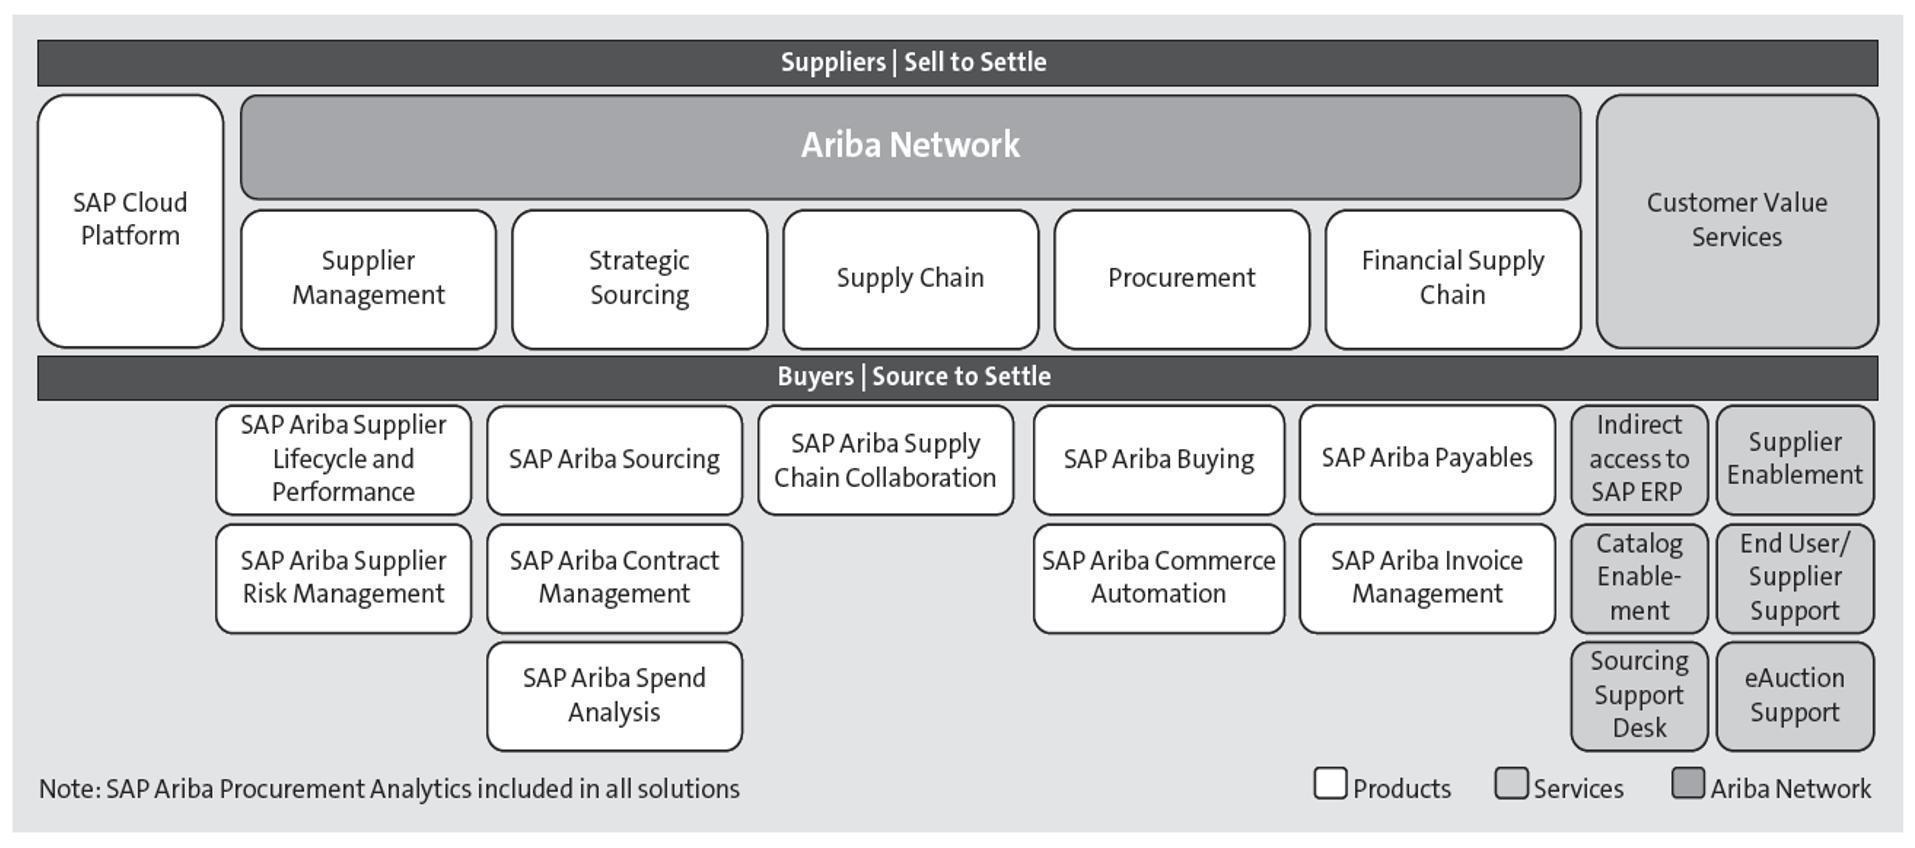 SAP Ariba Solutions